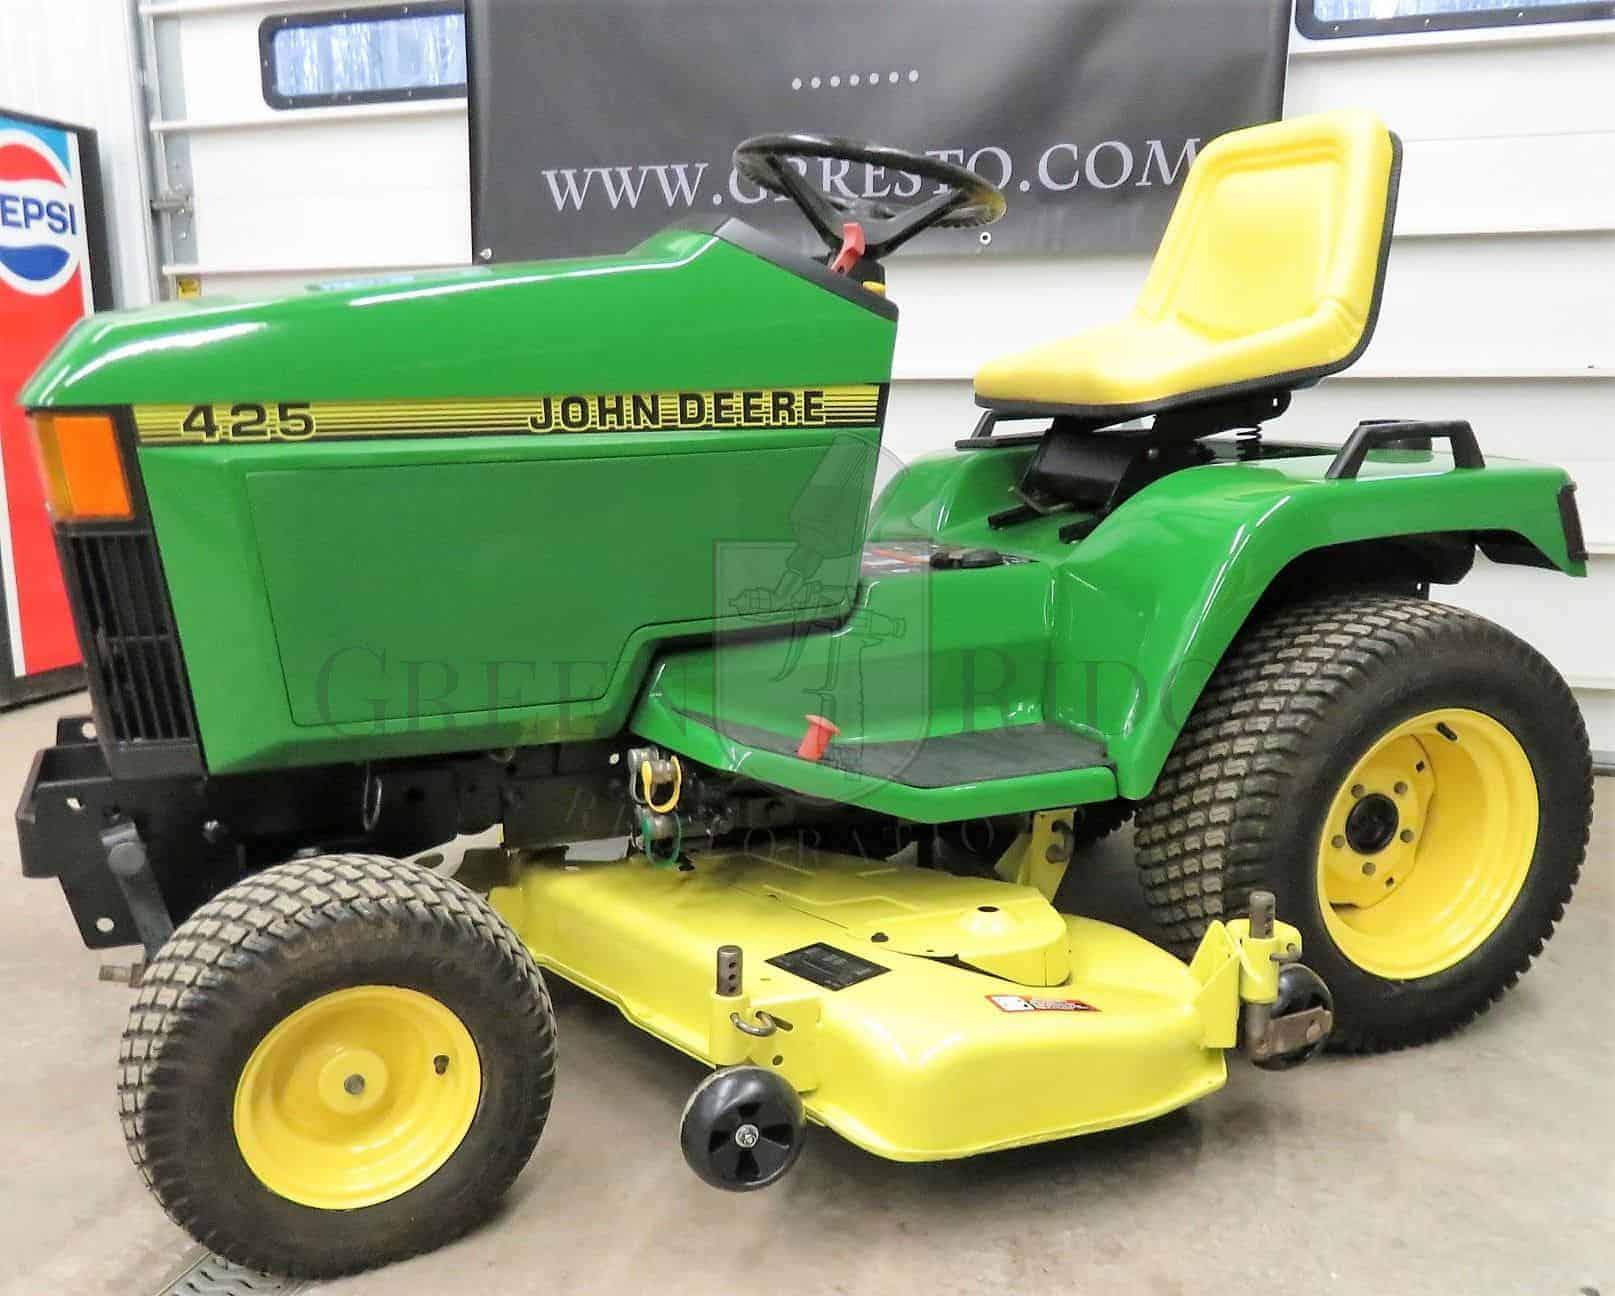 John Deere 445 >> John Deere 425 445 455 Lawn Tractors The Next Generation